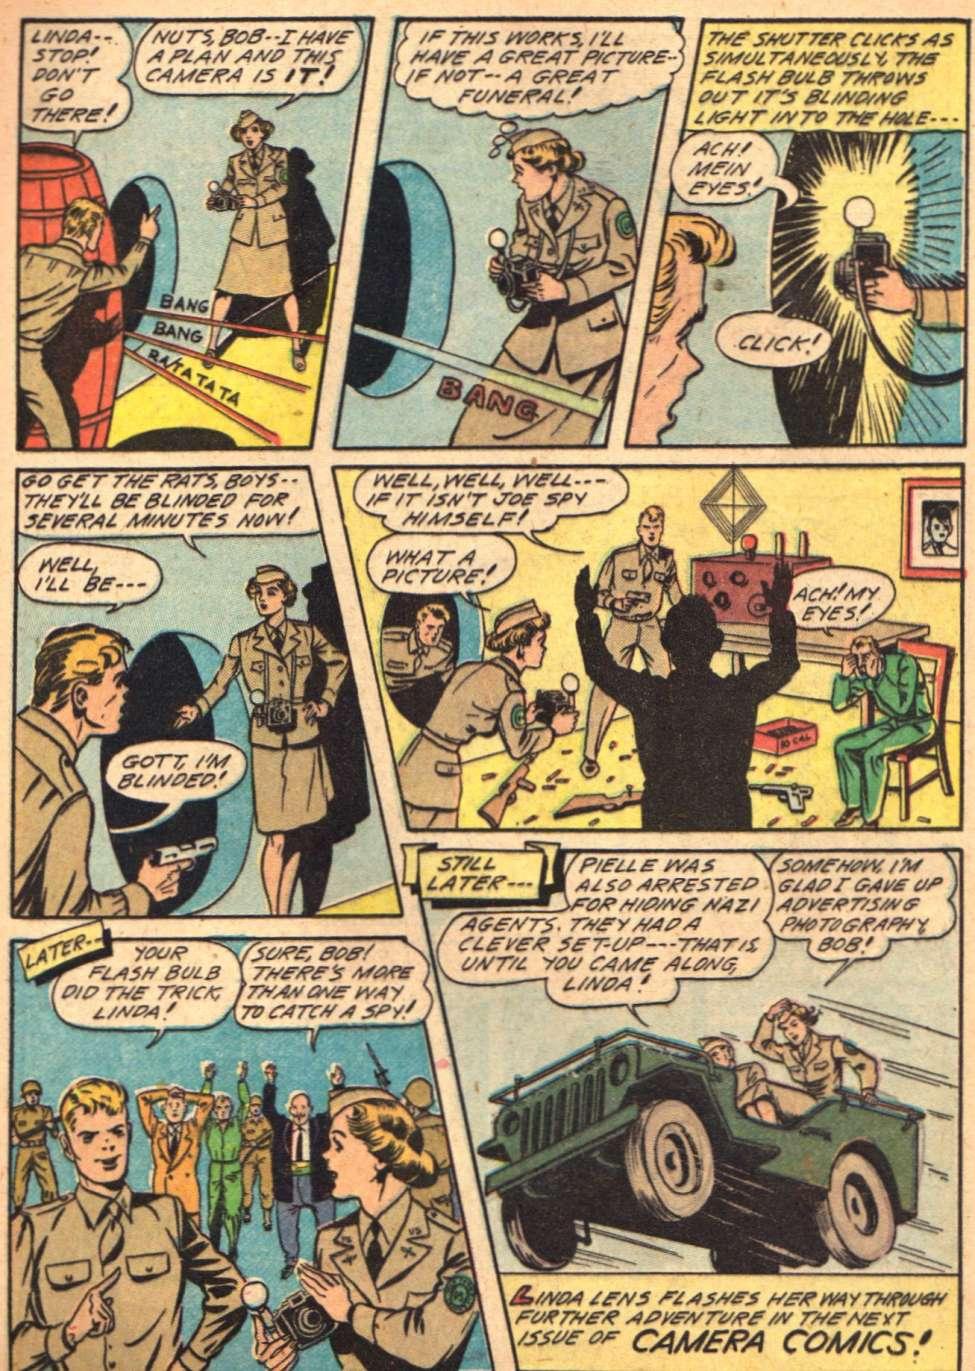 Comic Book Cover For Camera Comics v1 3 (3)